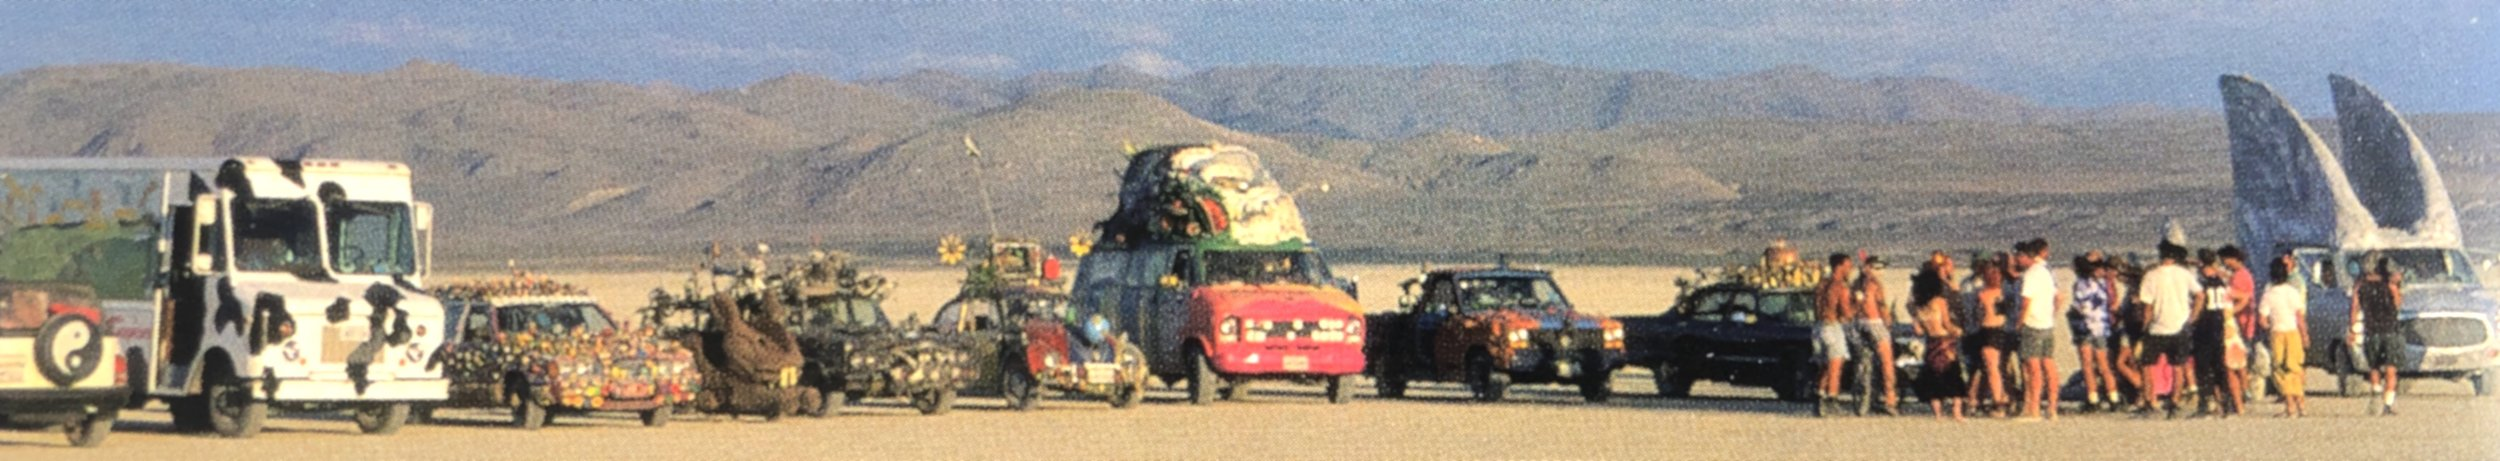 1995 art cars.JPG